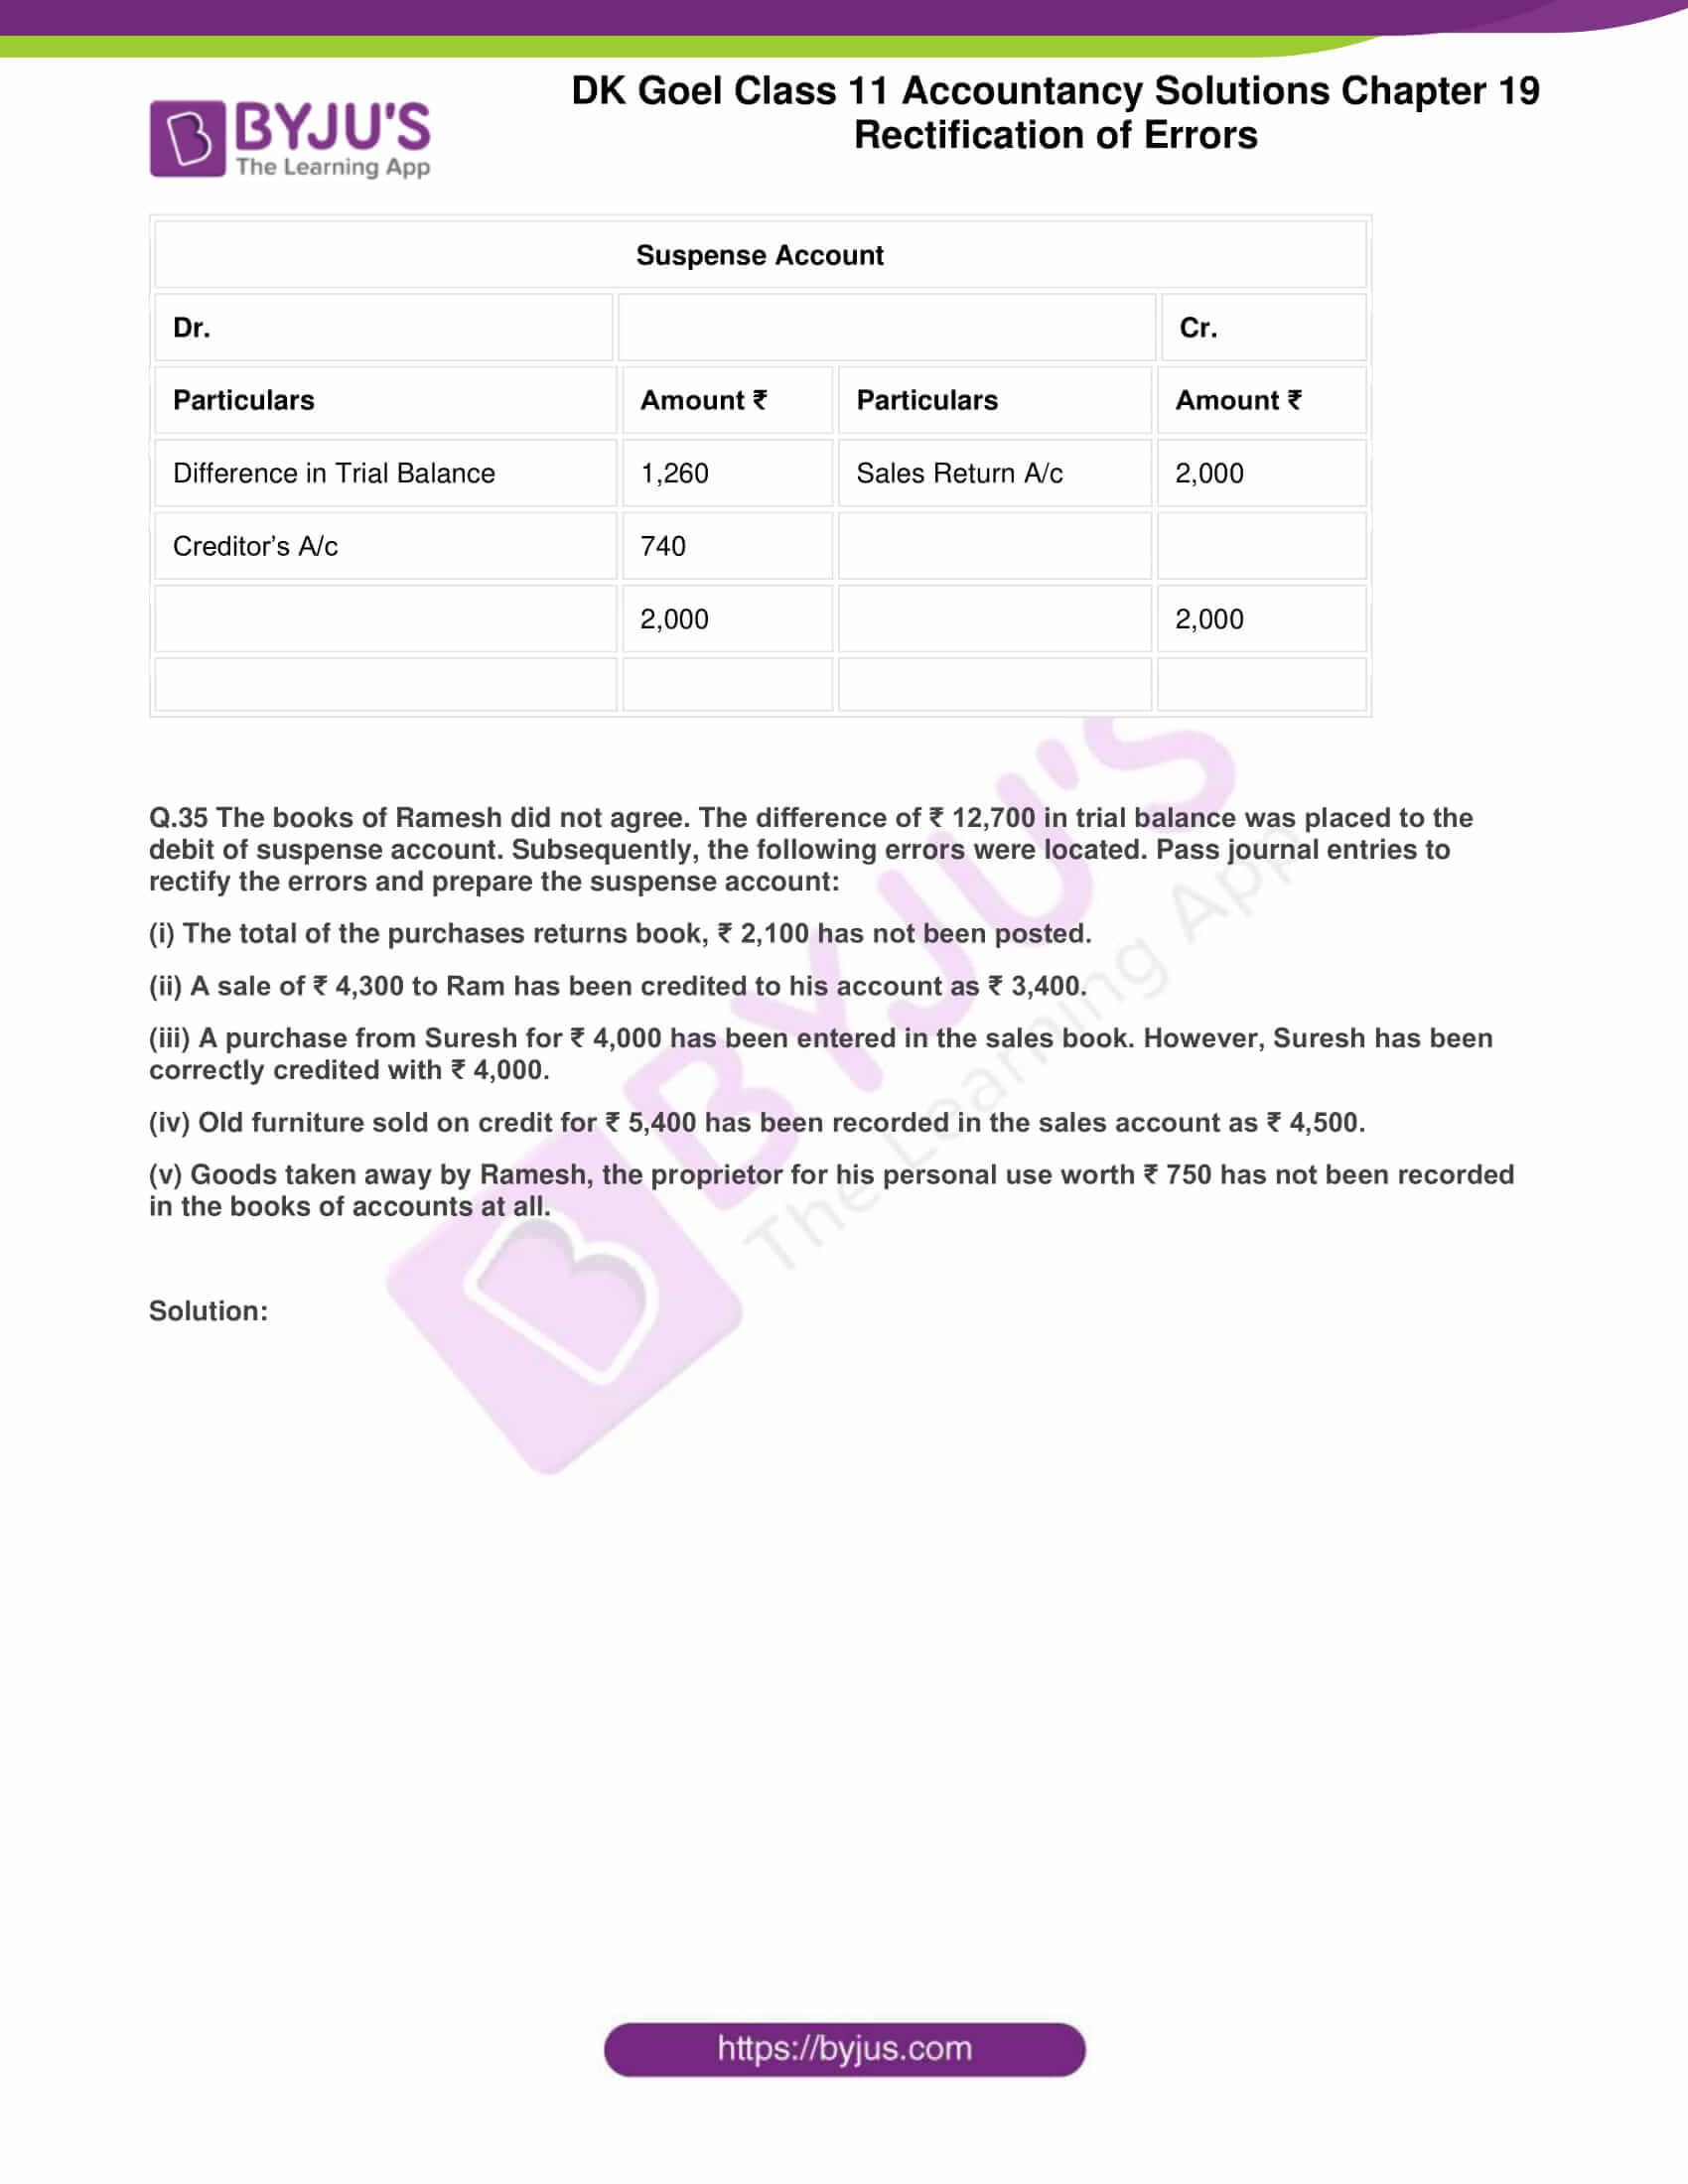 dk goel solutions class 11 accountancy chapter 19 rectification 67